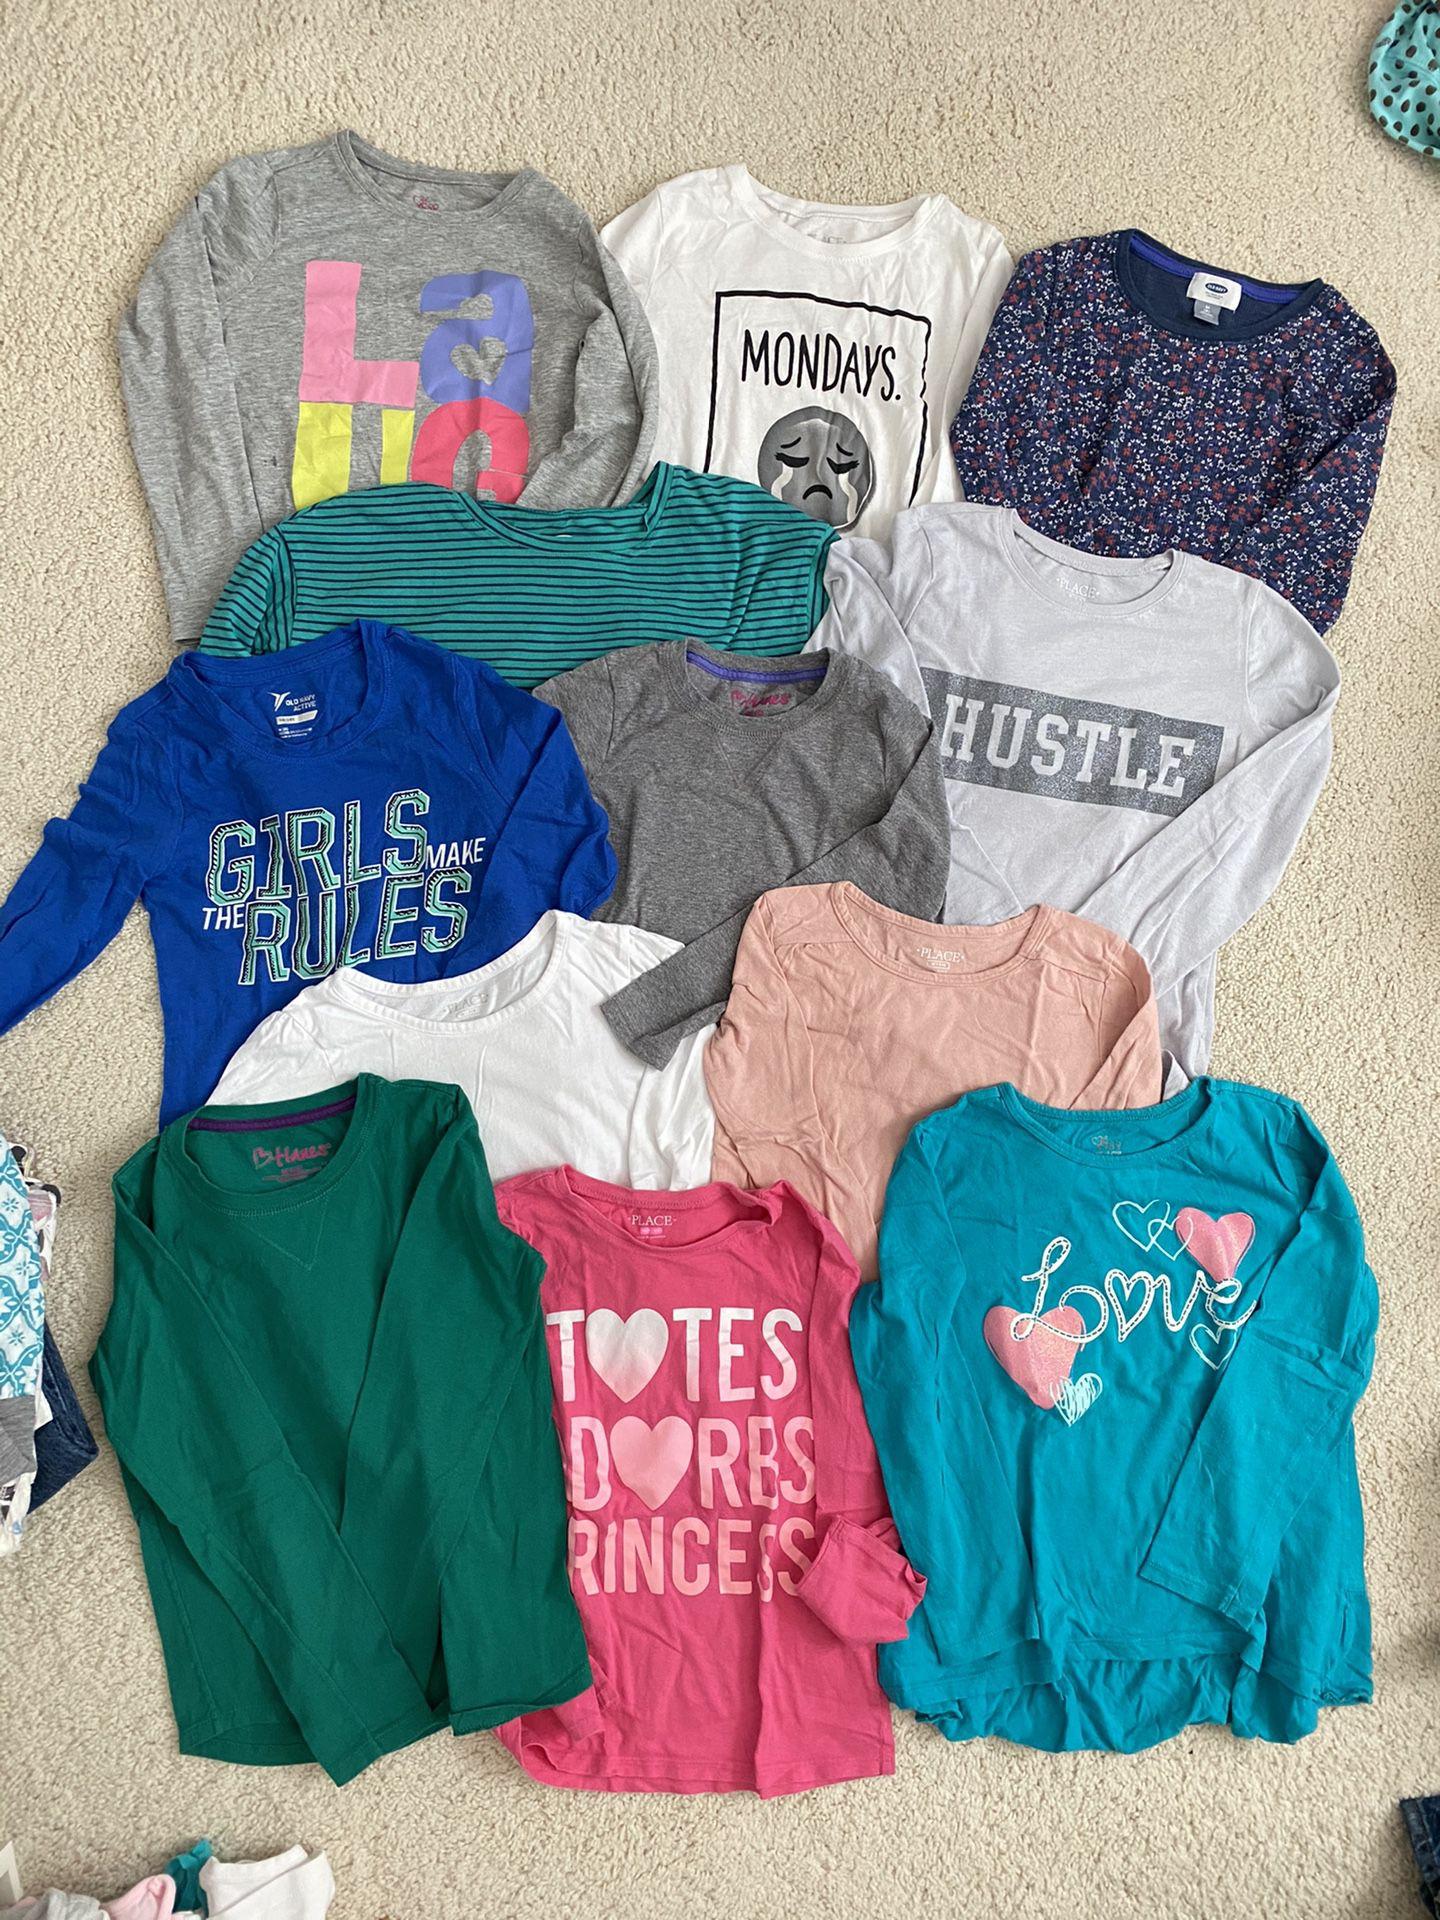 Girls long sleeve shirts, sizes 7-8, $1 each